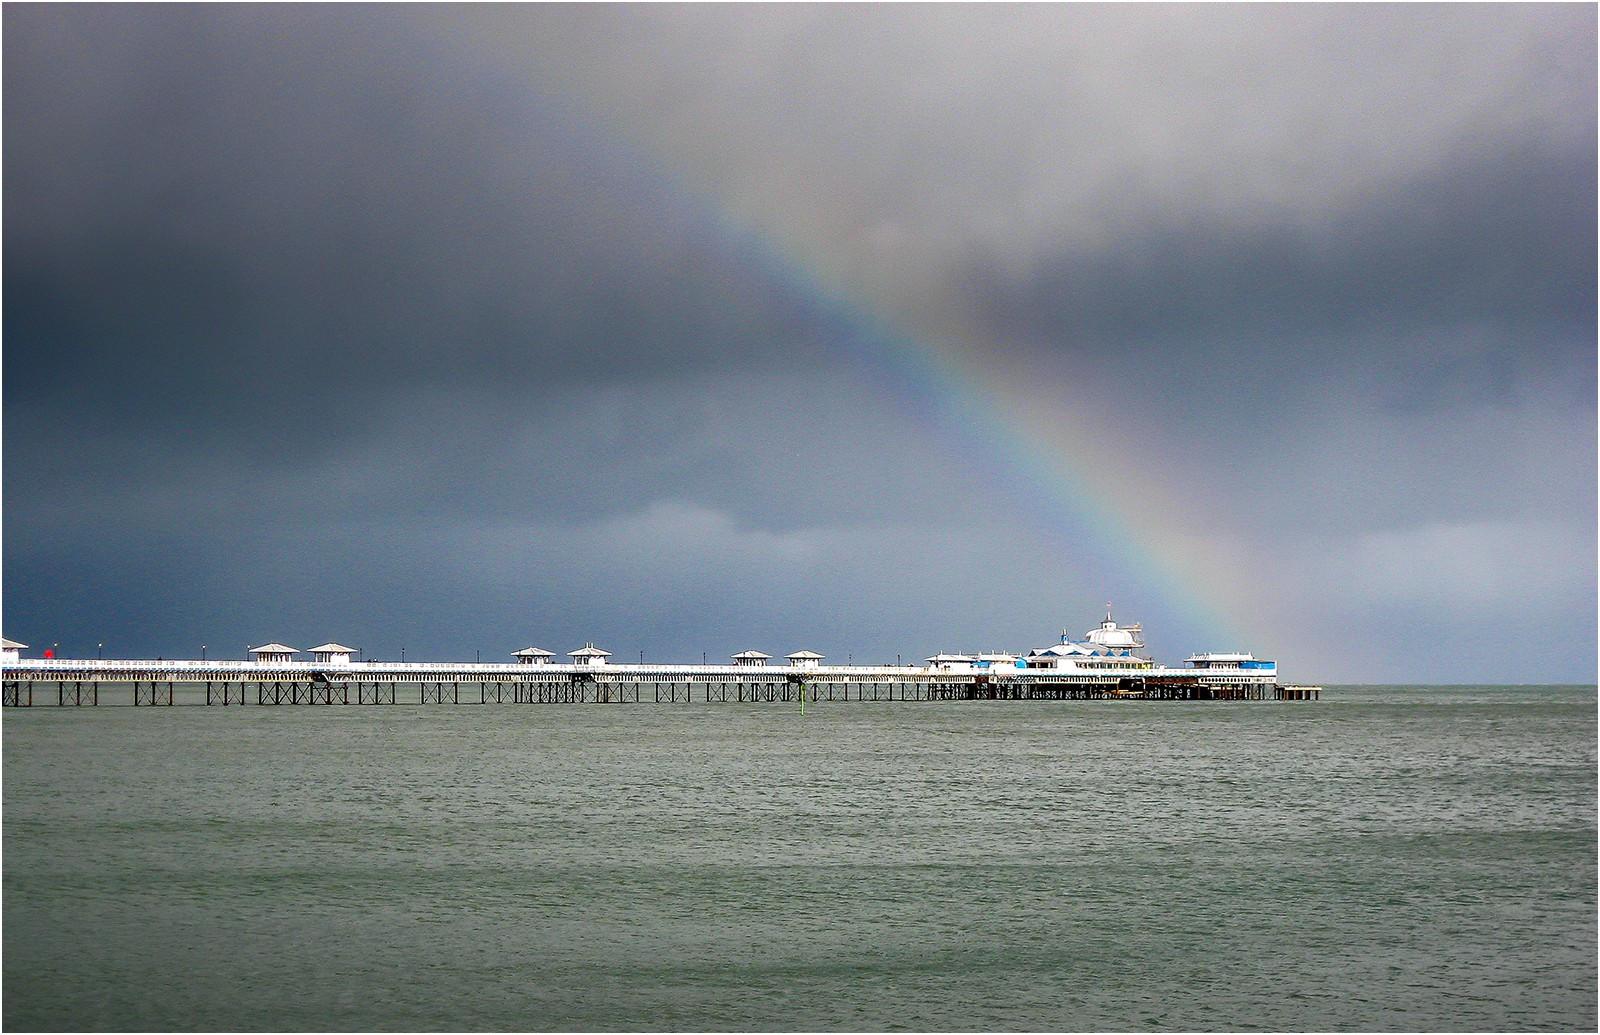 10.LLandudno Pier